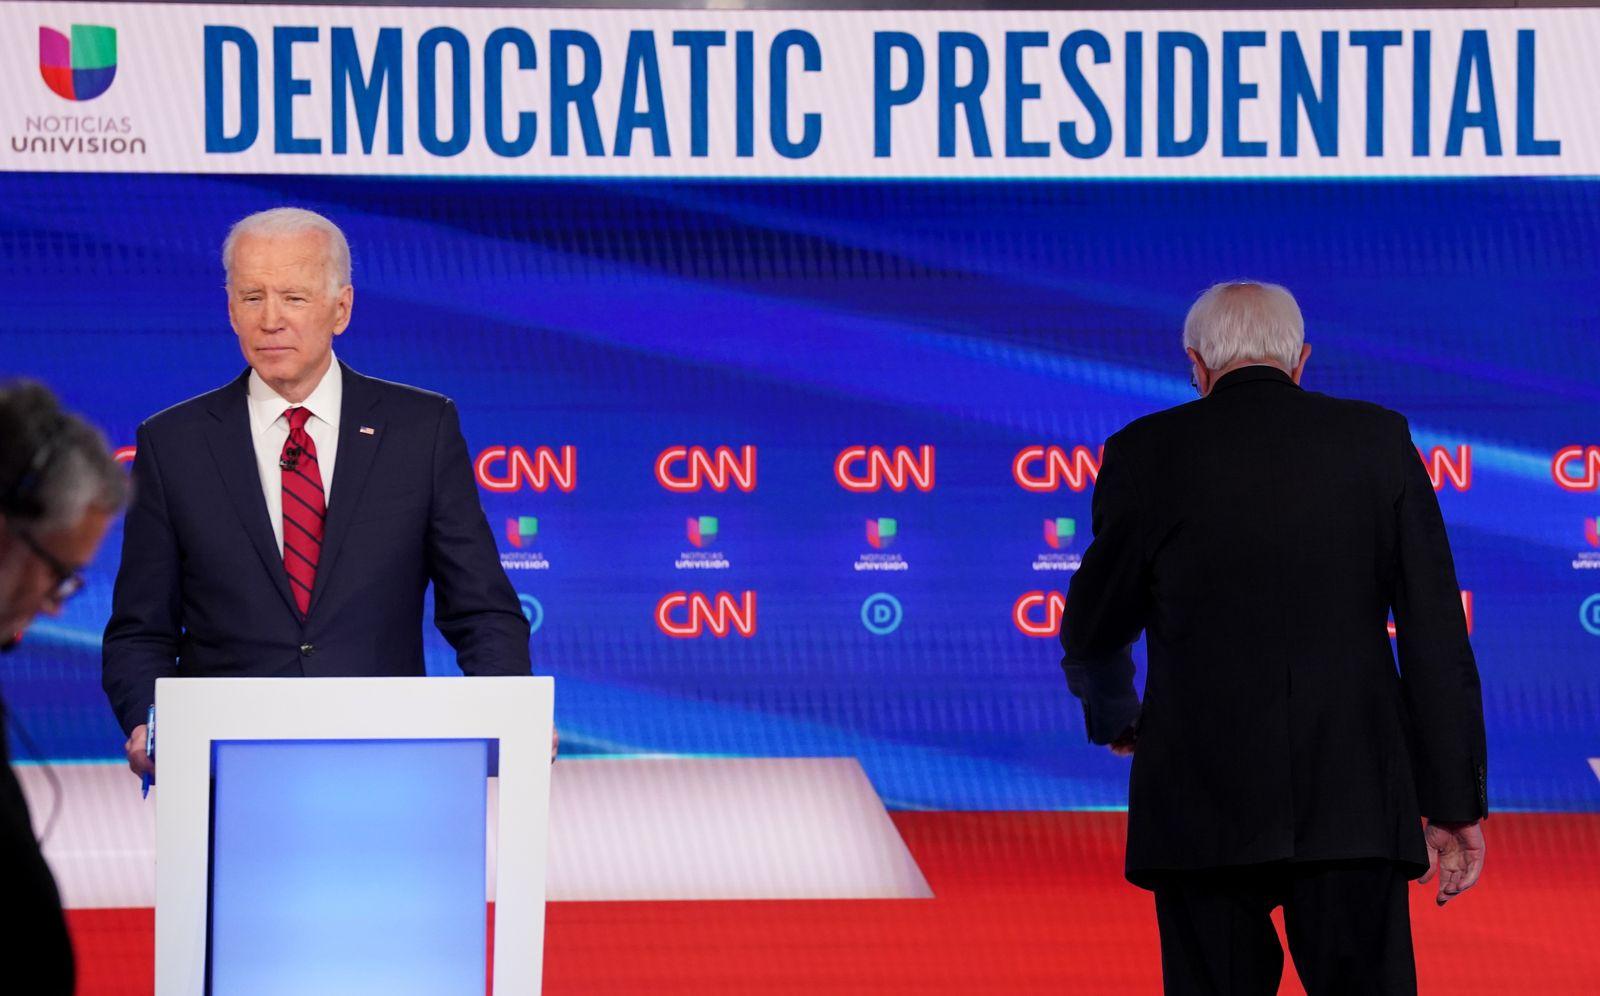 Democratic U.S. presidential candidates Senator Bernie Sanders and former Vice President Joe Biden during break at the 11th Democratic candidates debate of the 2020 U.S. presidential campaign in Washington